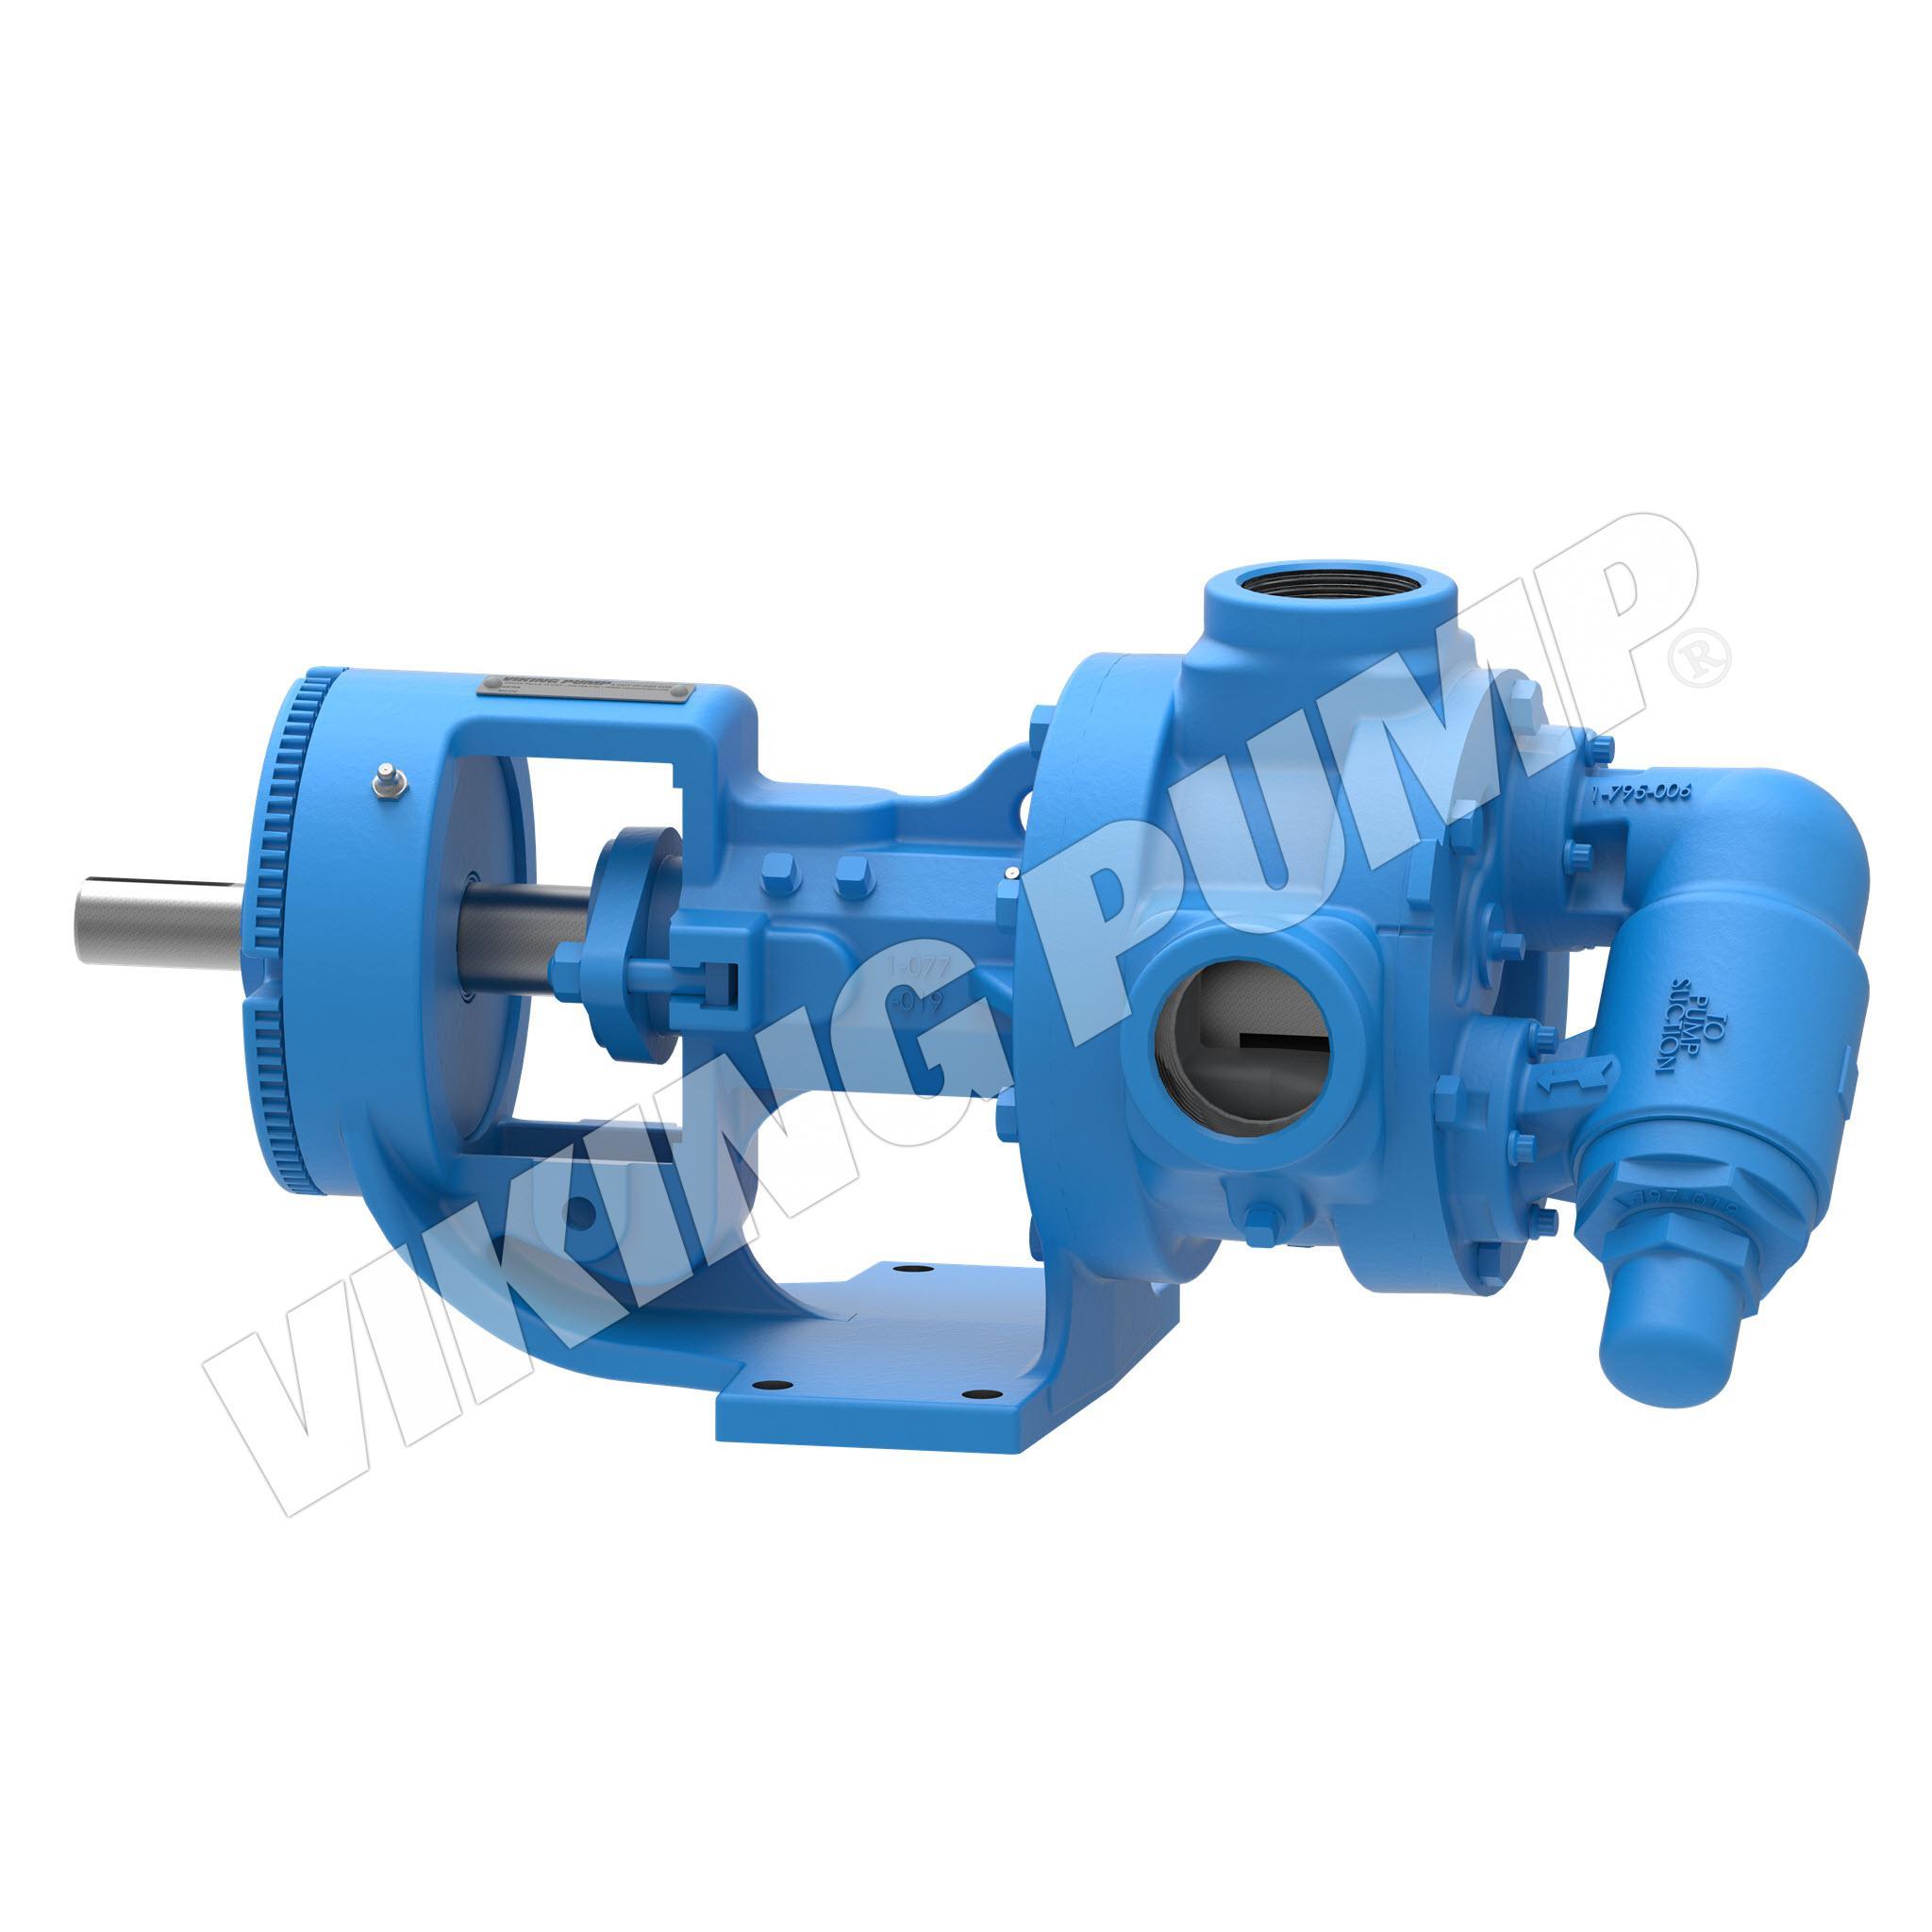 Viking Pump Ll124 Diagram Car Wiring Diagrams Explained 4124a Series Rh Vikingpump Com